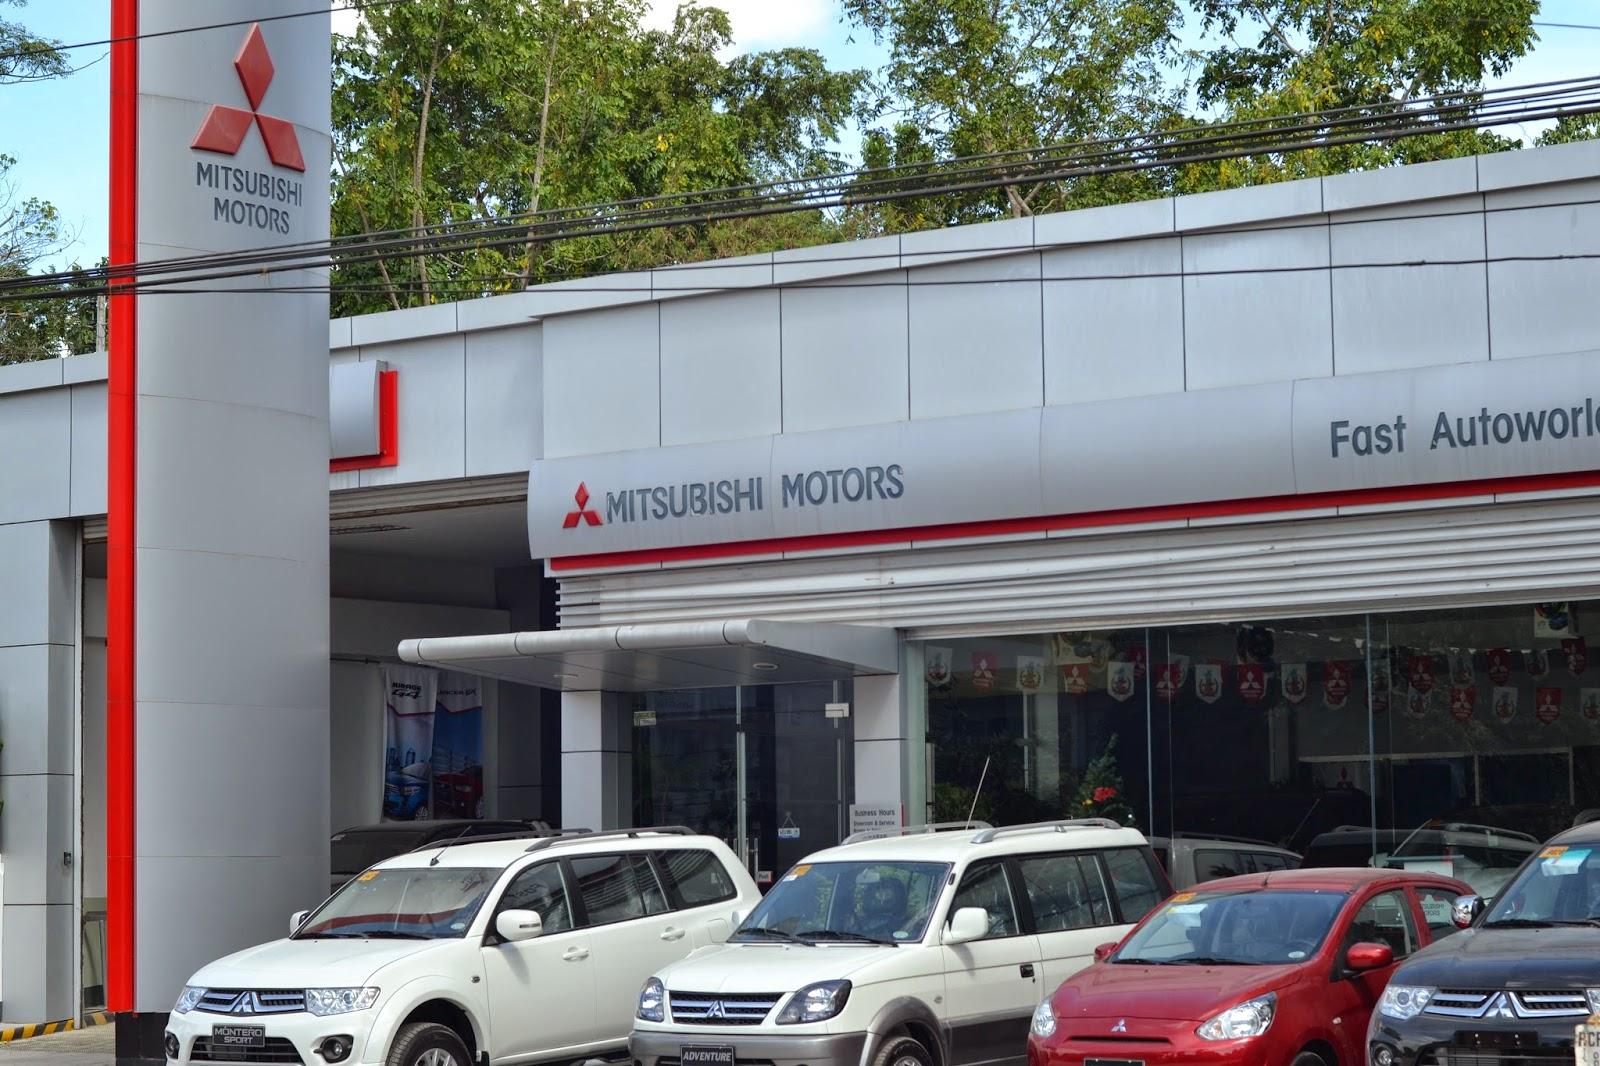 Mitsubishi Motors Vehicle Price List as of November 2014  All